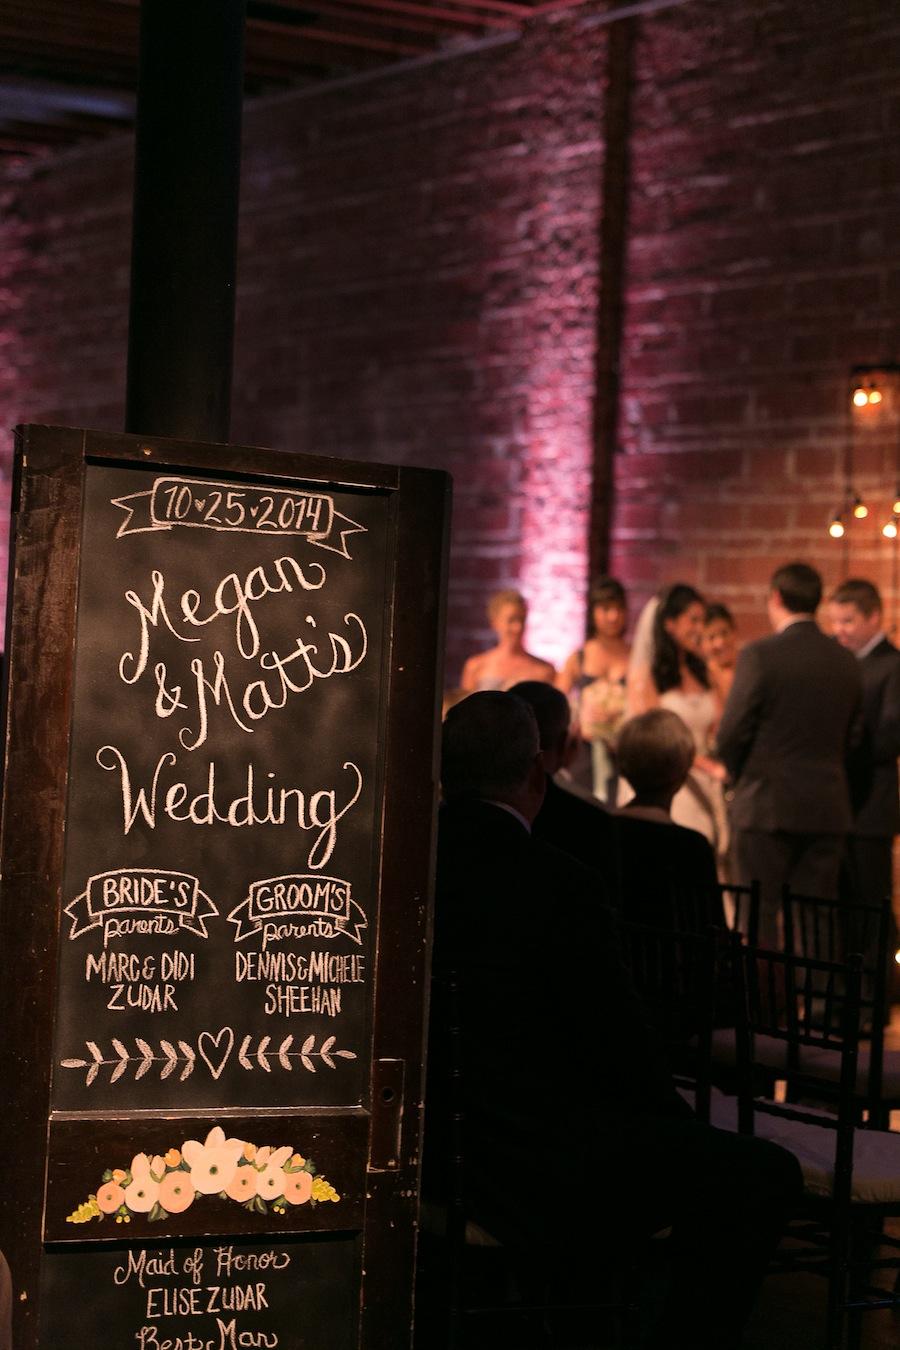 17 NOVA 535 Wedding Ceremony